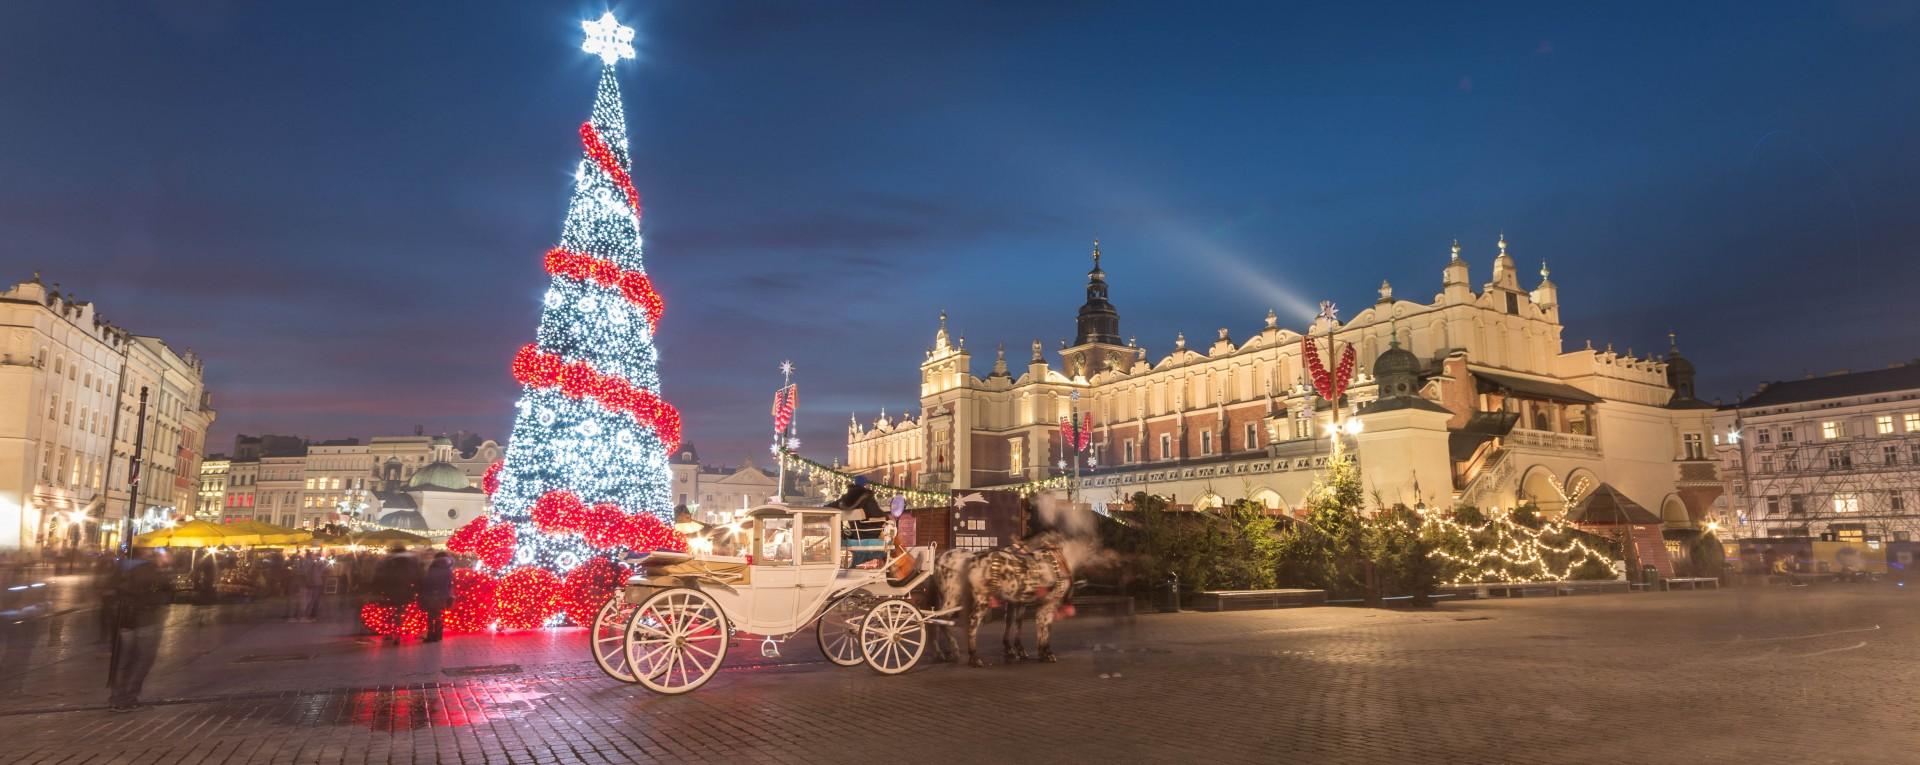 Польша накануне рождества